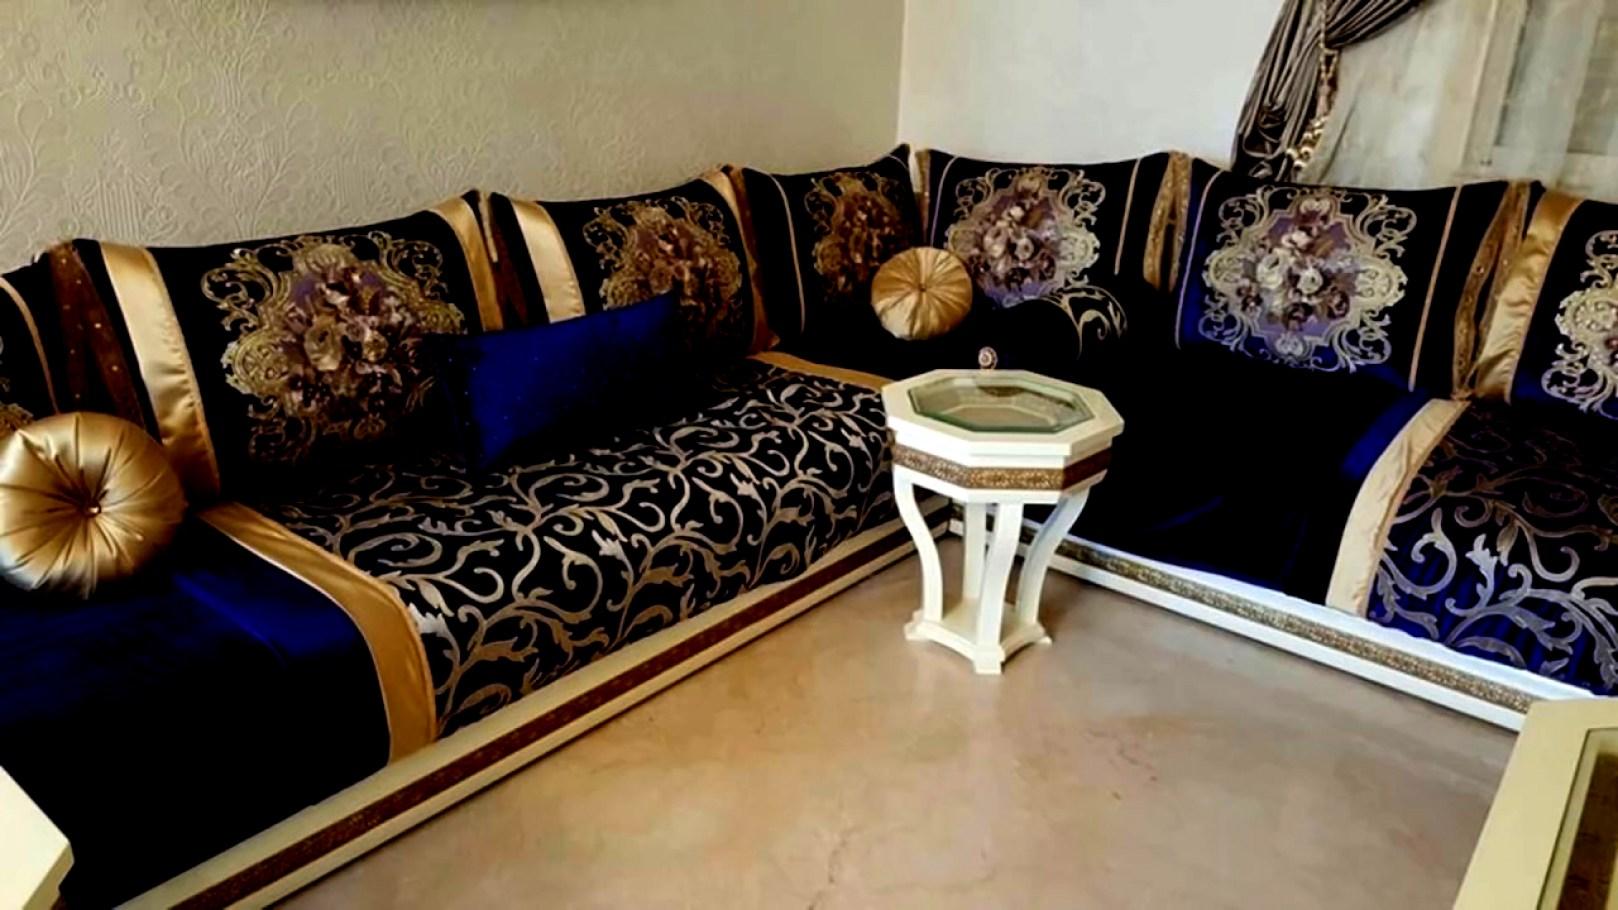 Vente salon marocain moderne 2019  Montpellier  Dco Salon Maroc